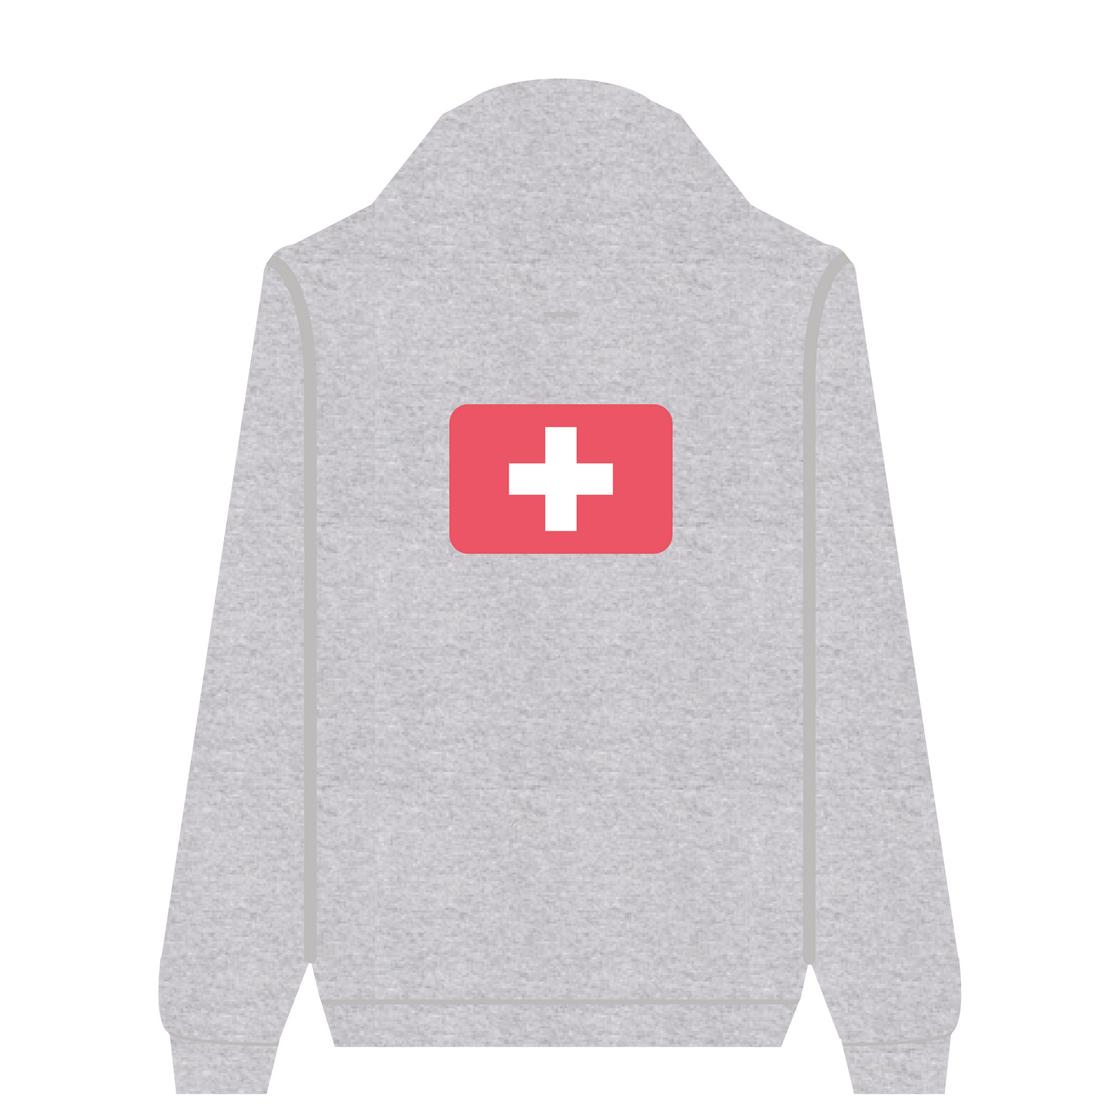 Full Zip Hoodie Swiss | Wuzzee